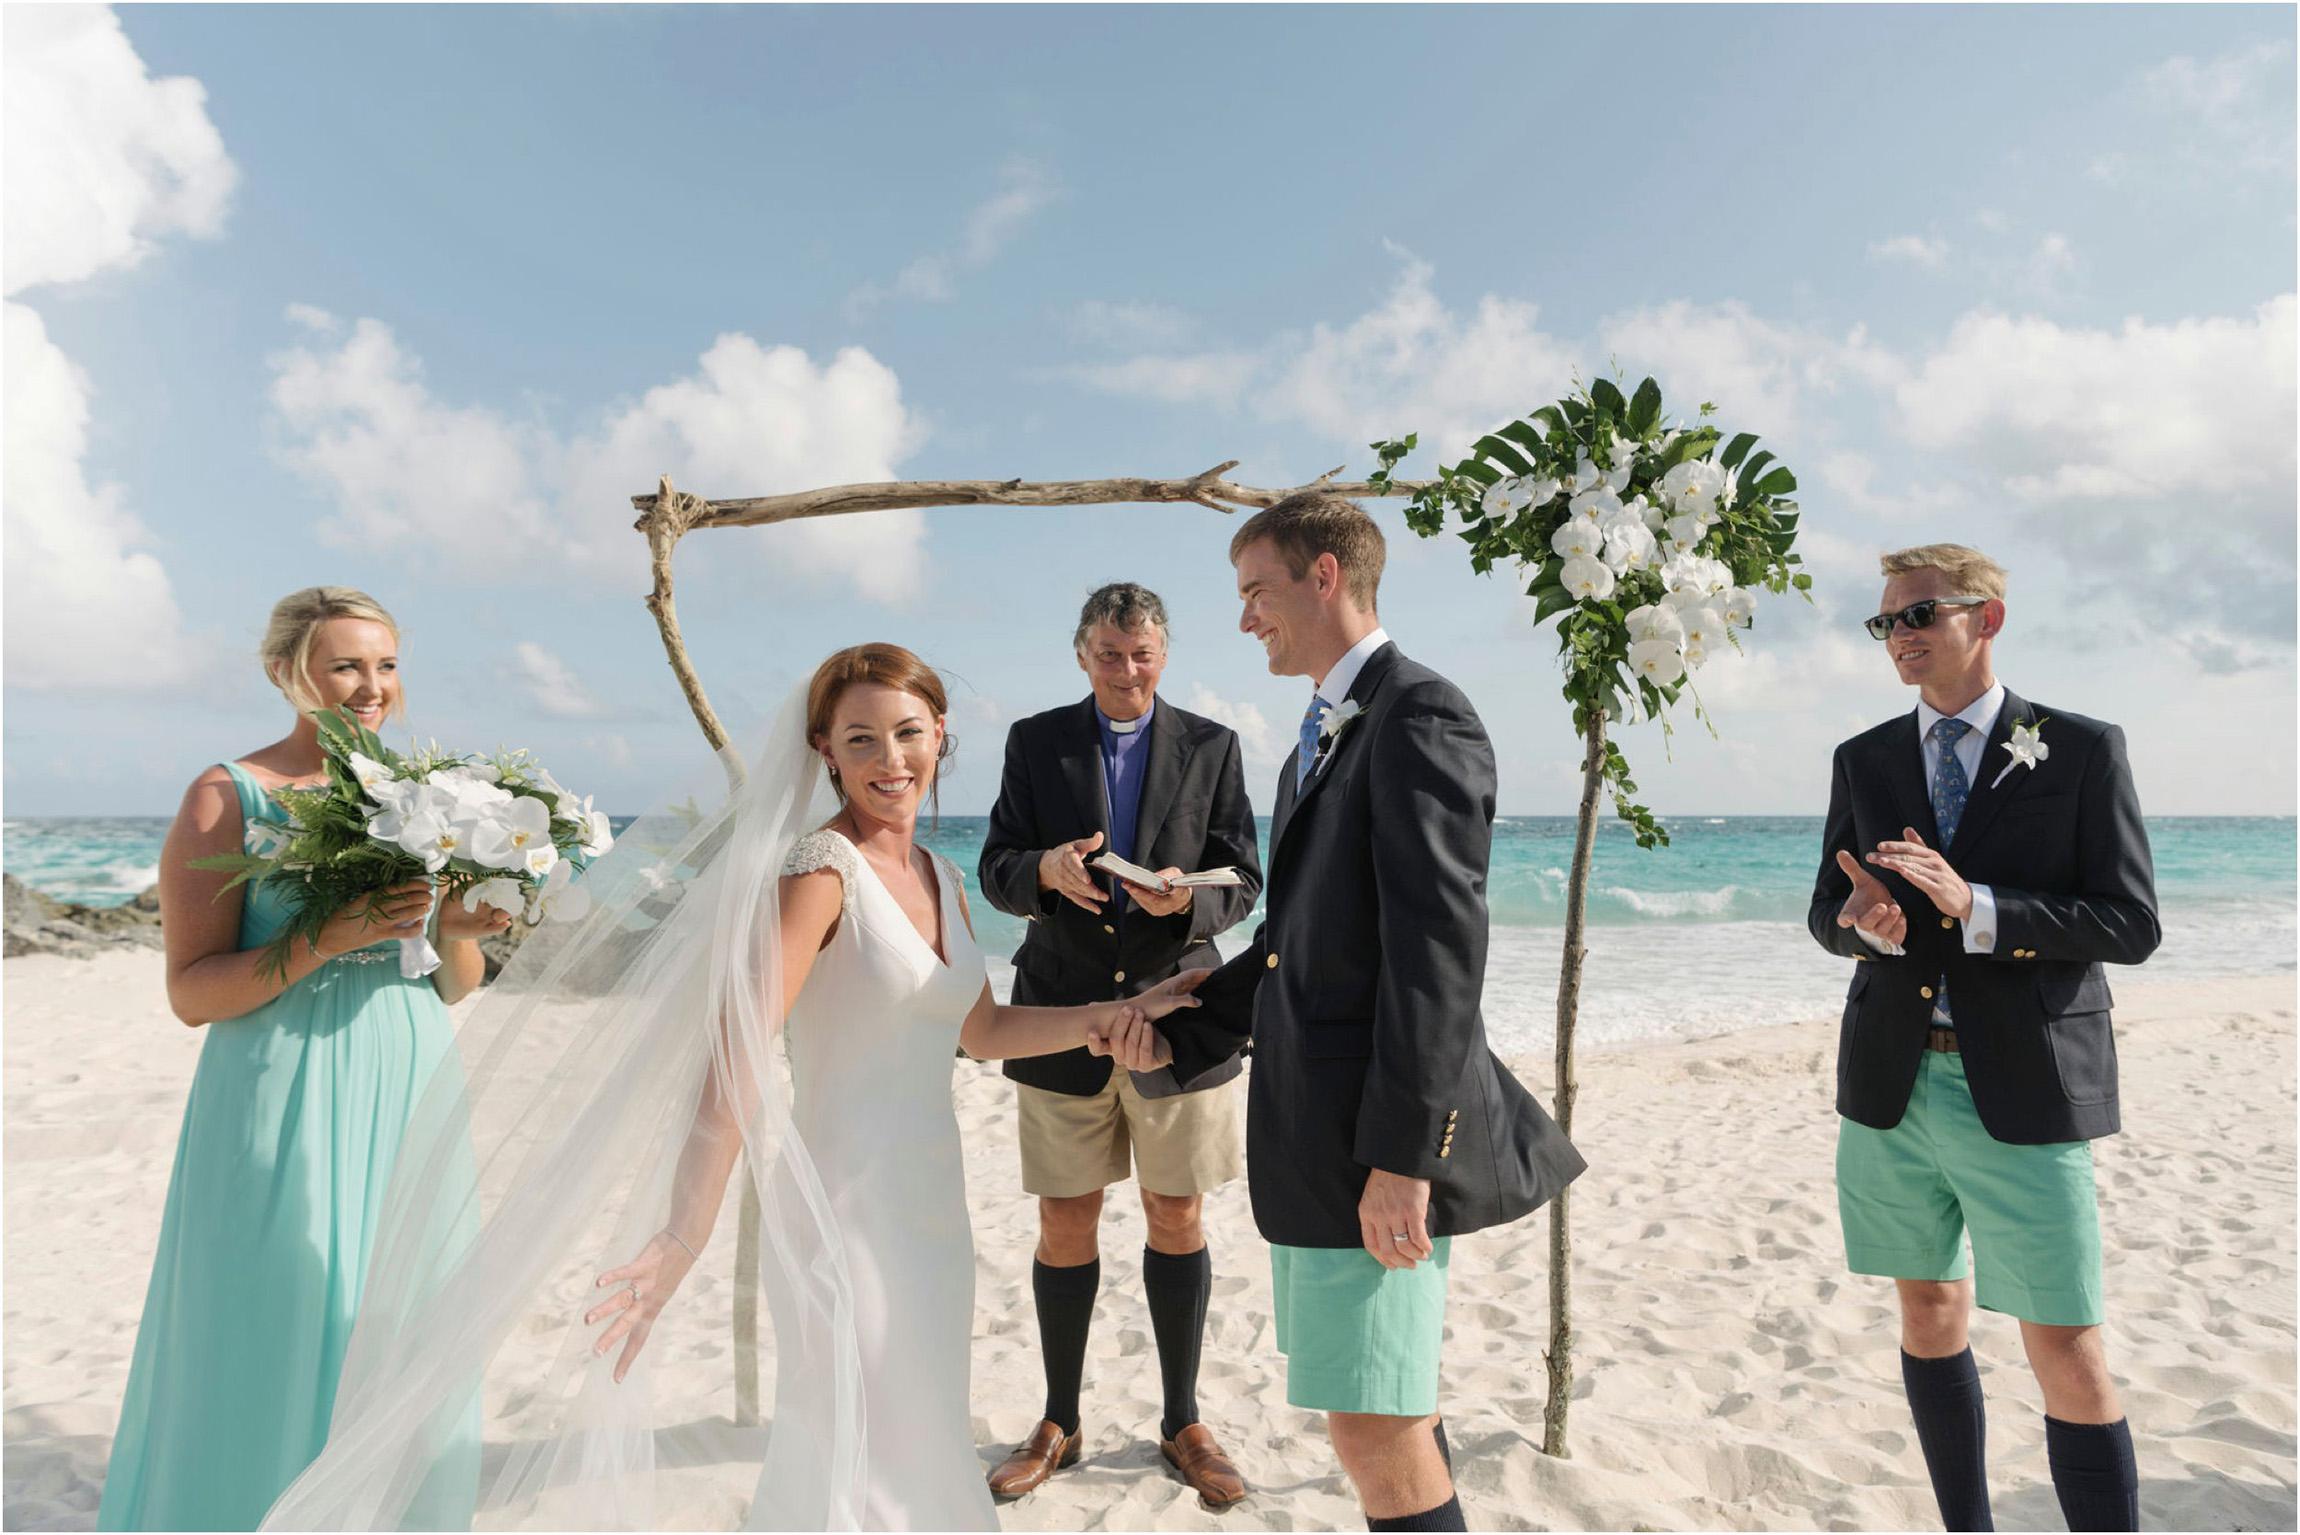 ©FianderFoto_Bermuda Wedding Photographer_Mid Ocean_Rachel_Angus_044.jpg